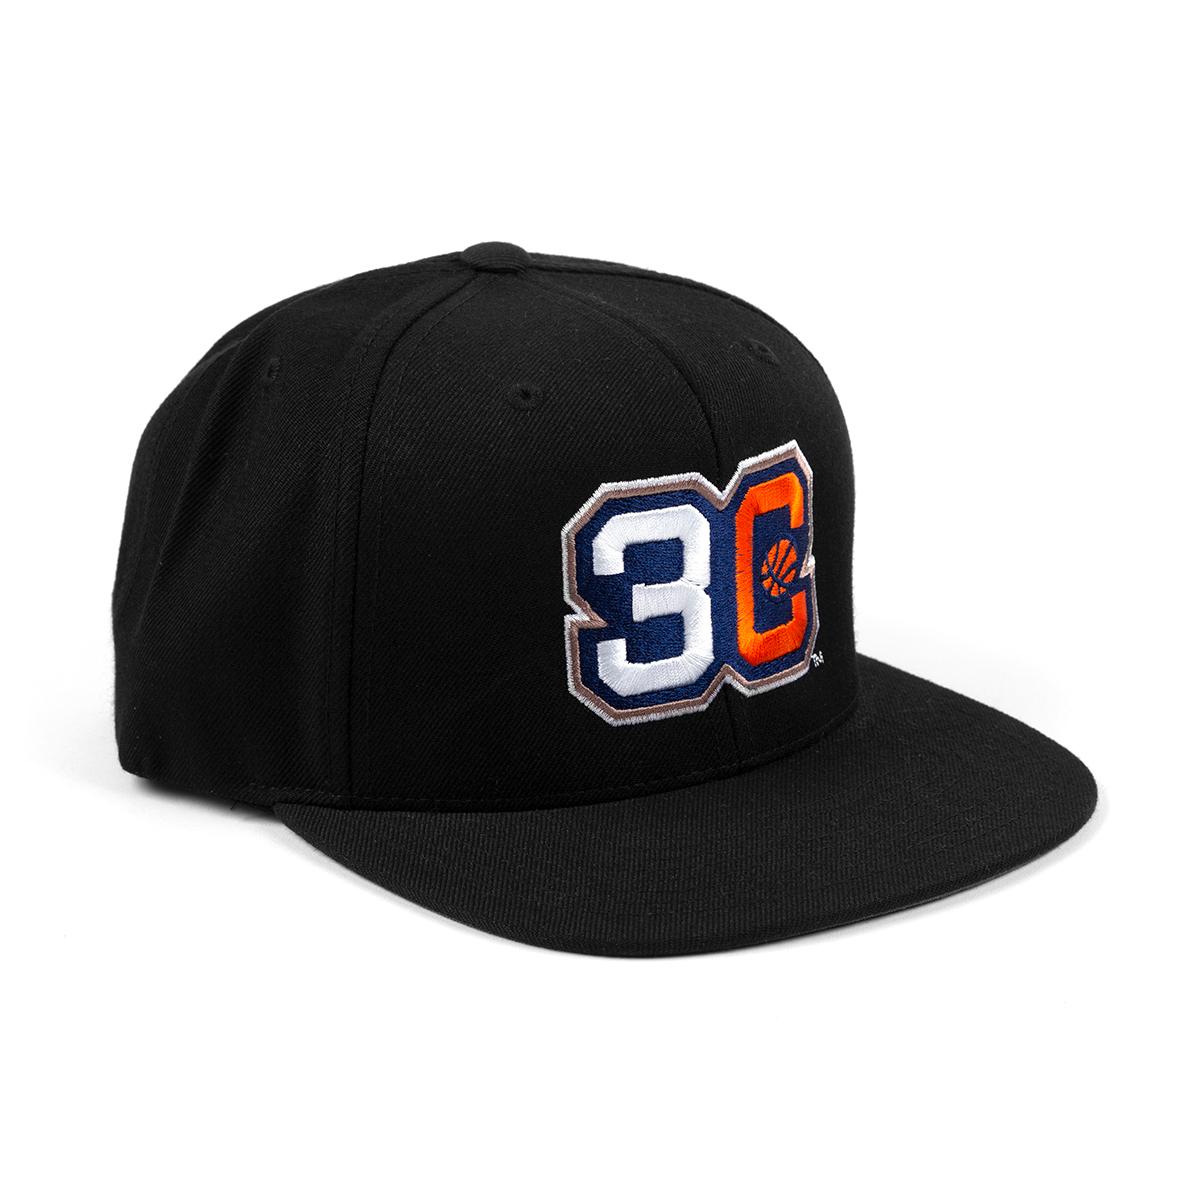 Three's Company Black Flatbrim Hat